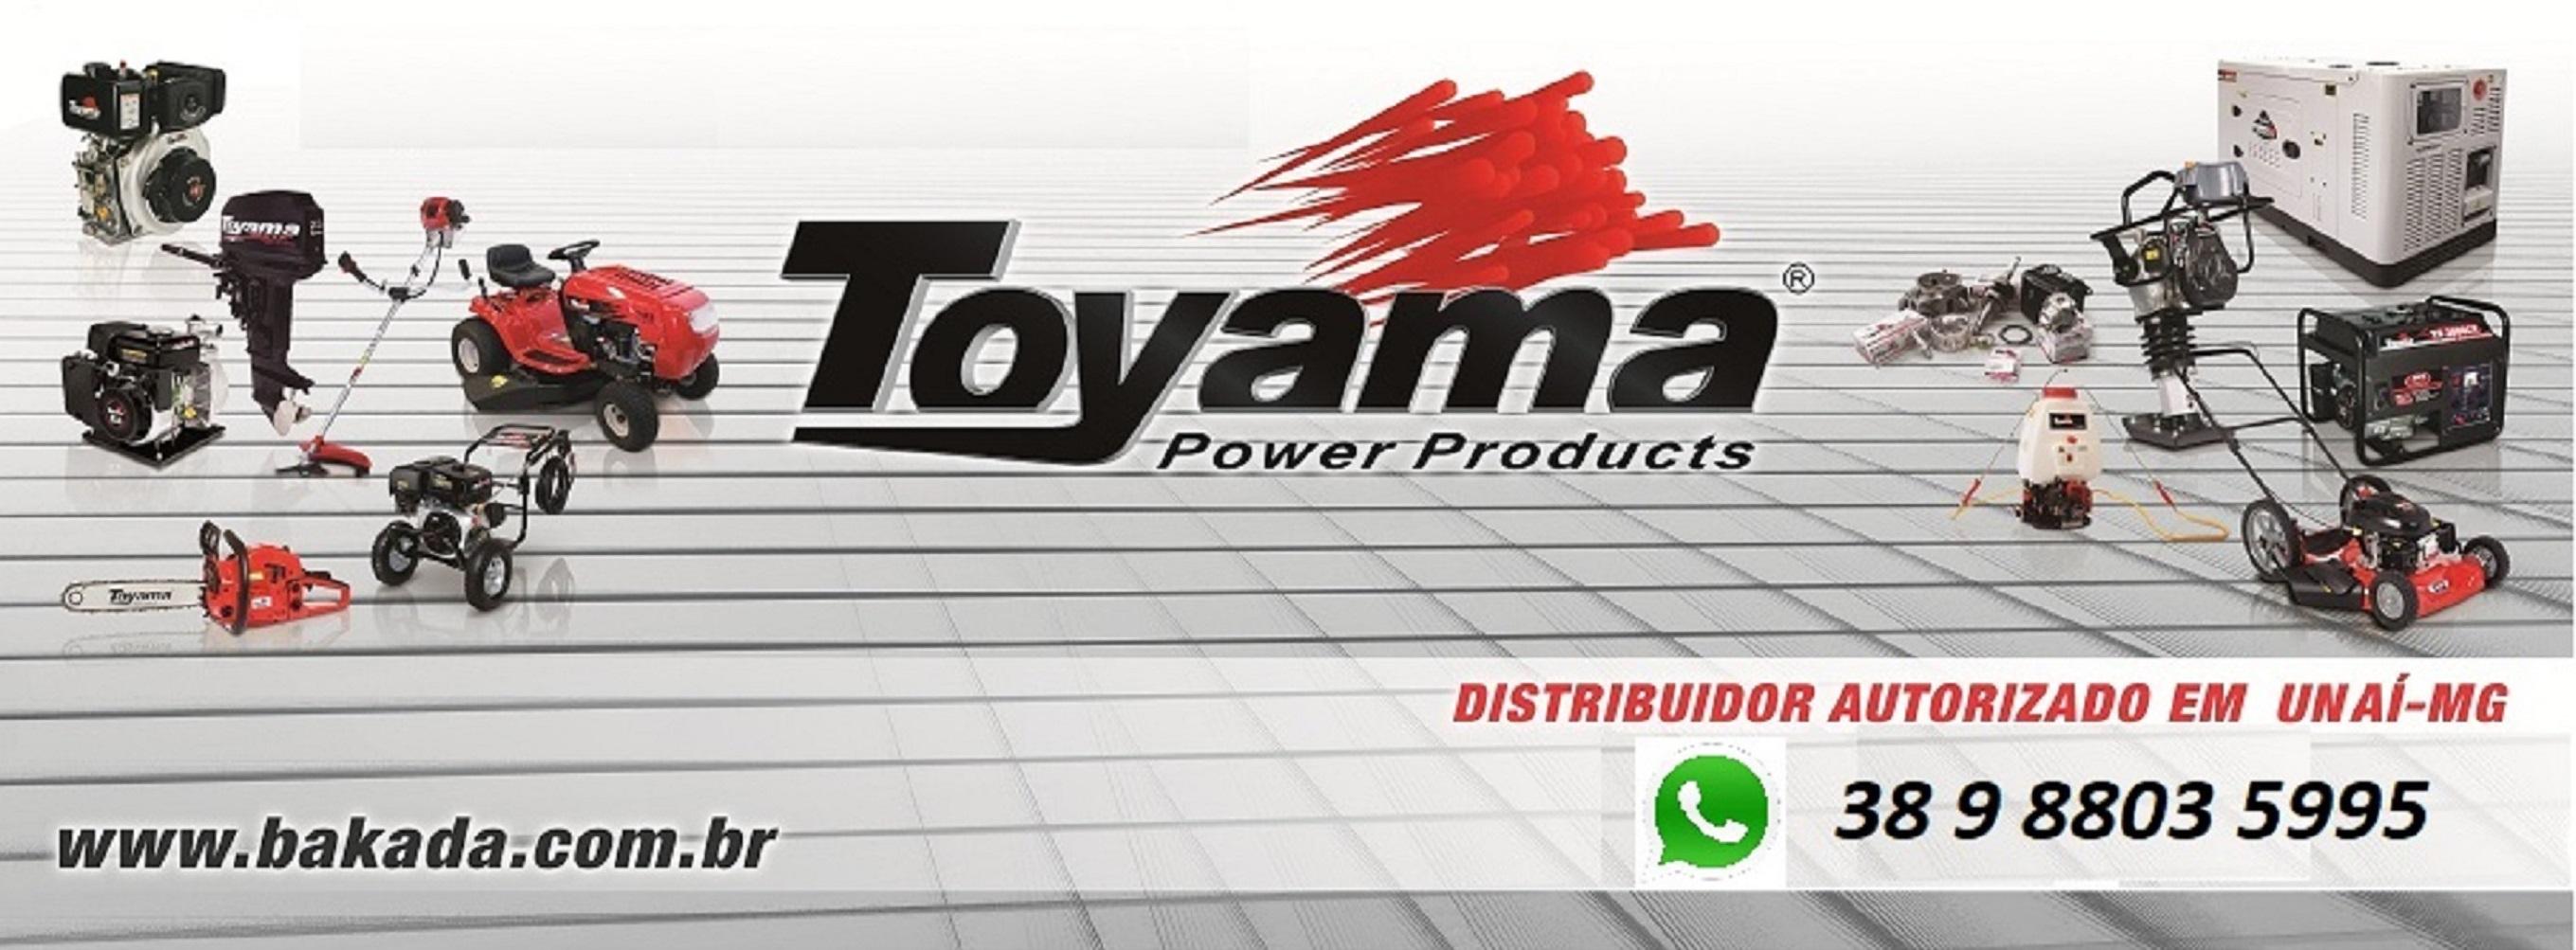 Toyama  Kawashima Unaí MG - Produtos de Força e Energia